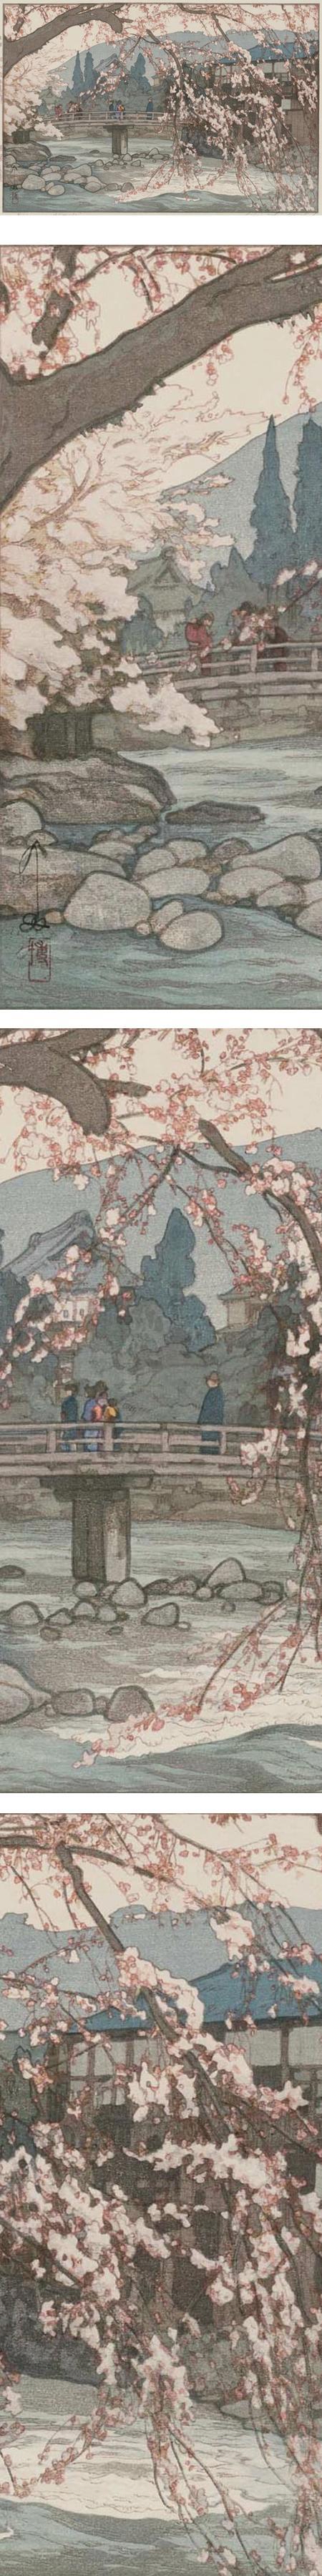 Spring in a Hot Spring (Onsen no haru), Hiroshi Yoshida